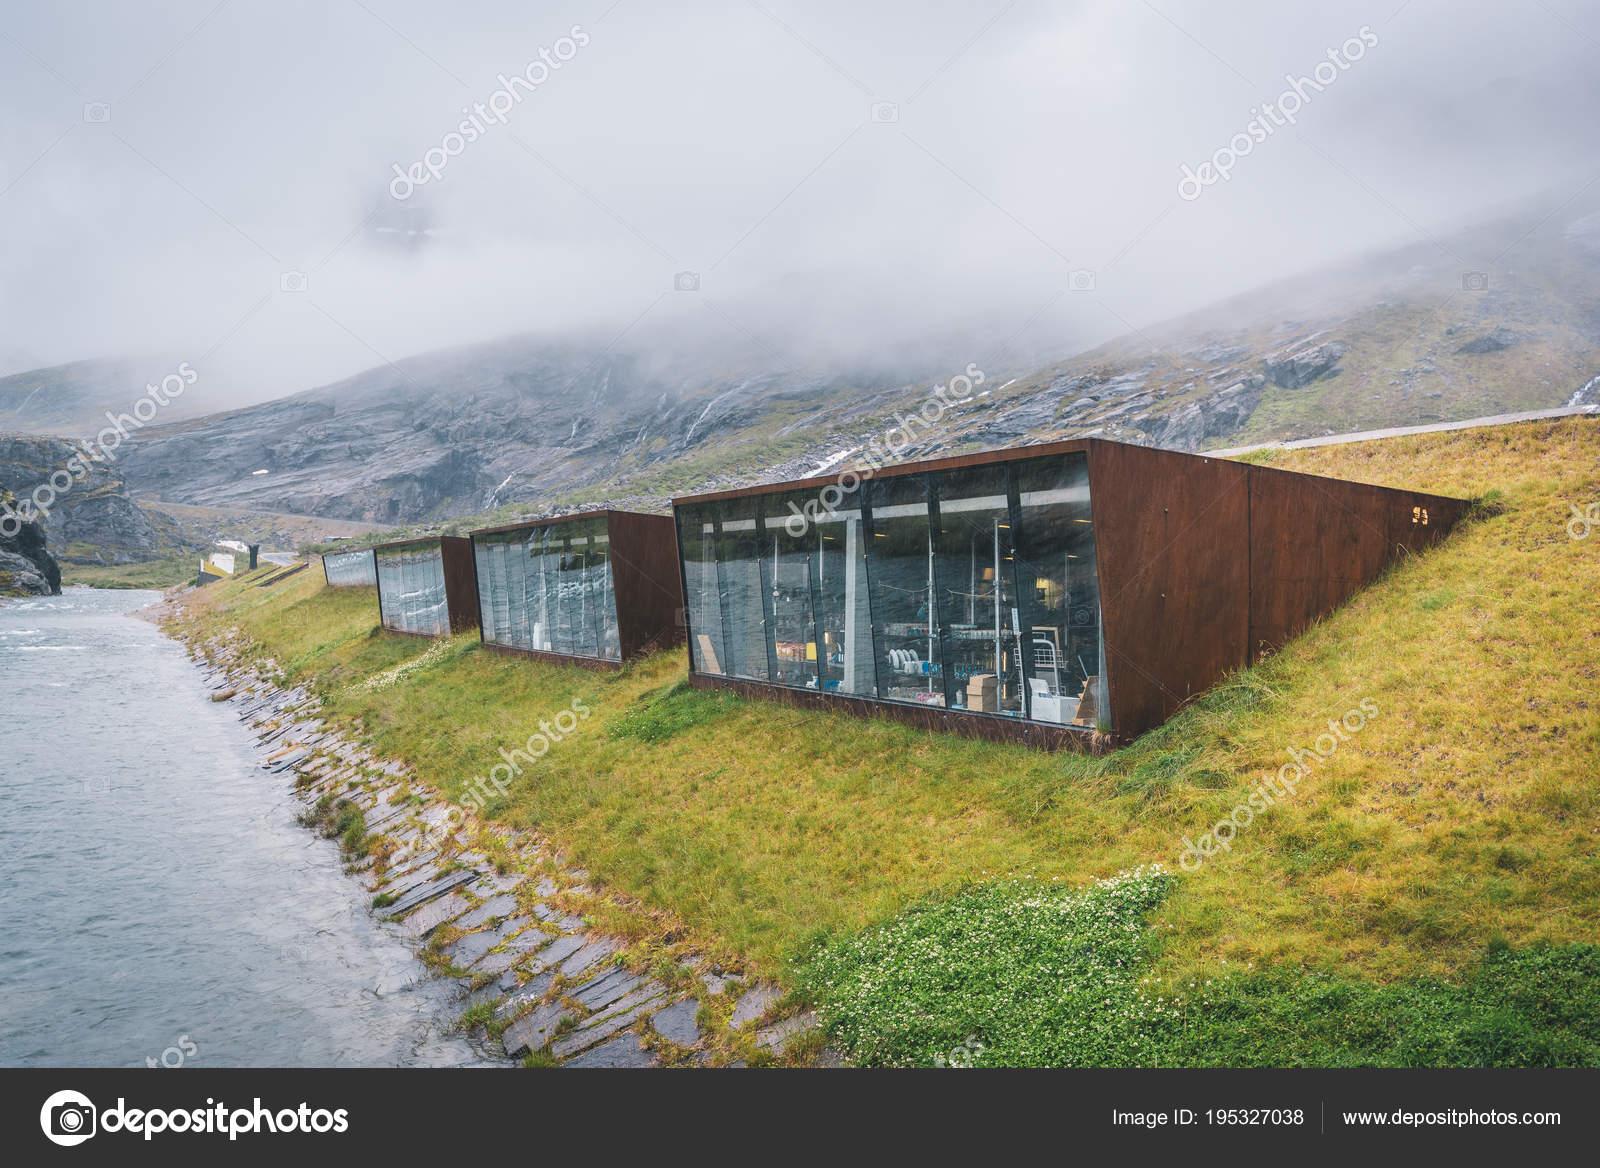 Modernas Cabañas Madera Noruegas Montaña Niebla Cerca Río